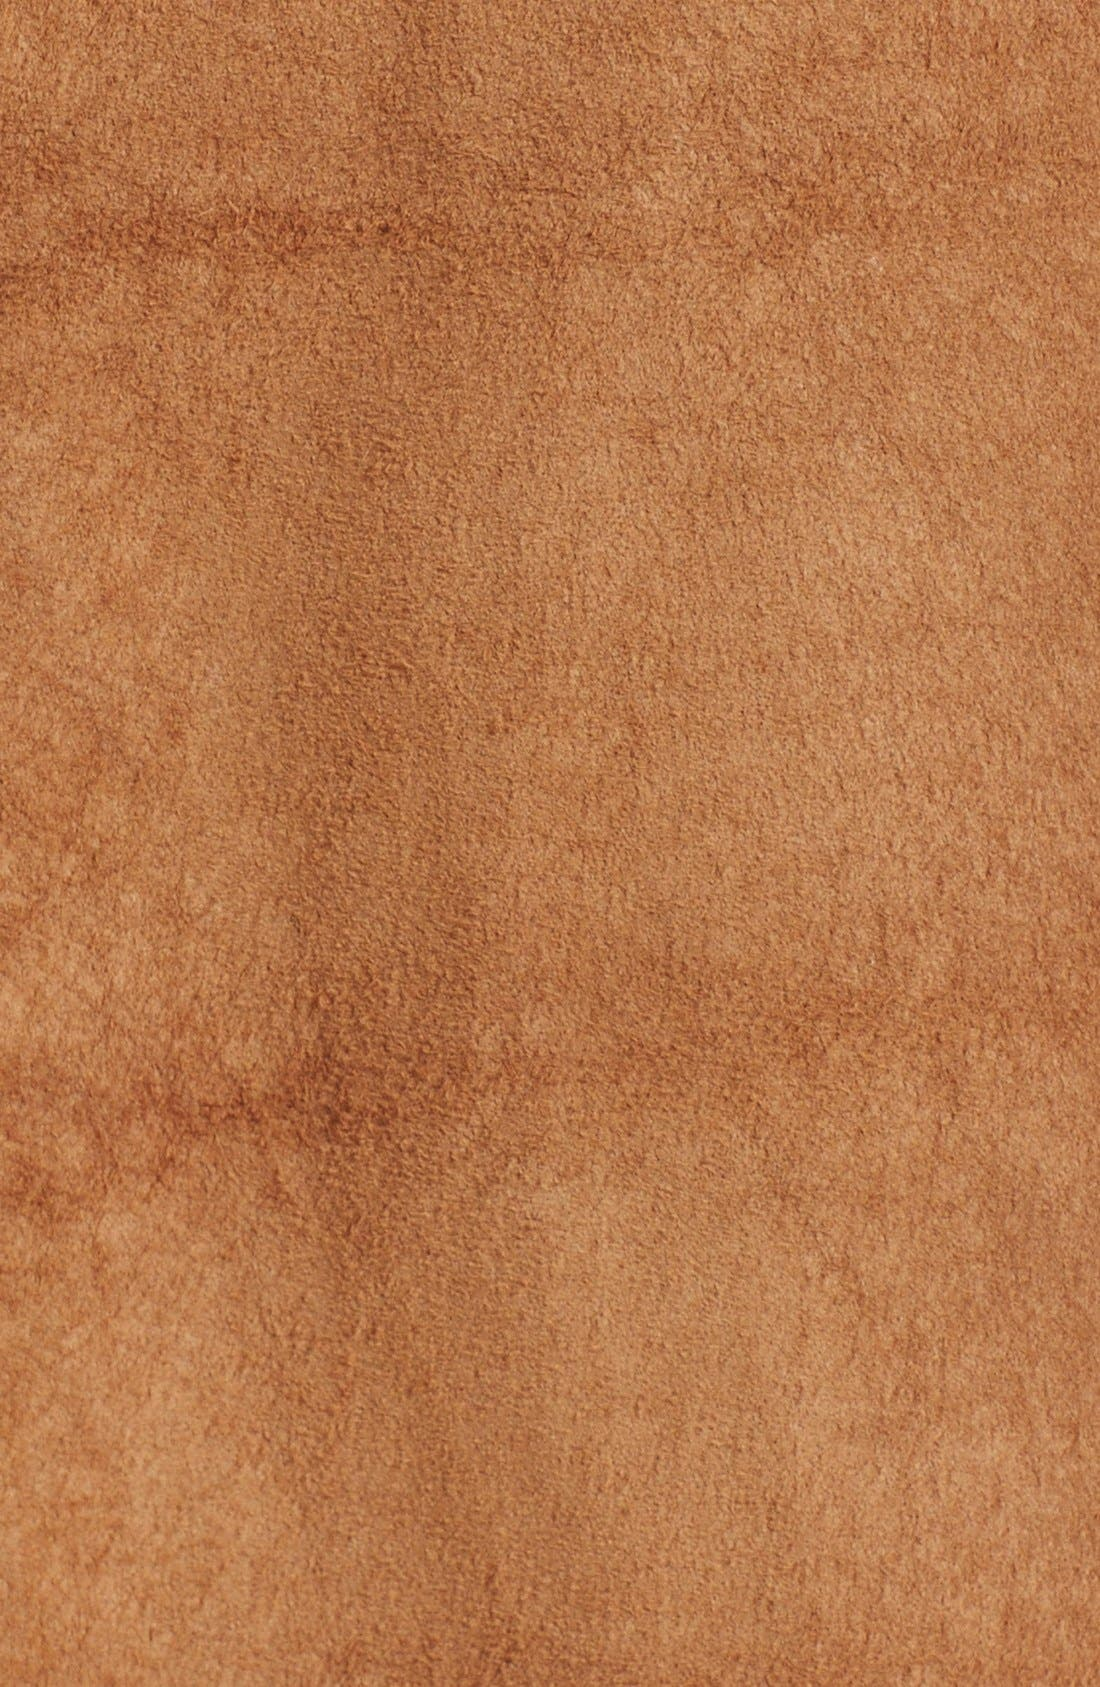 Alternate Image 3  - Theory 'Pemma' Suede Midi Skirt